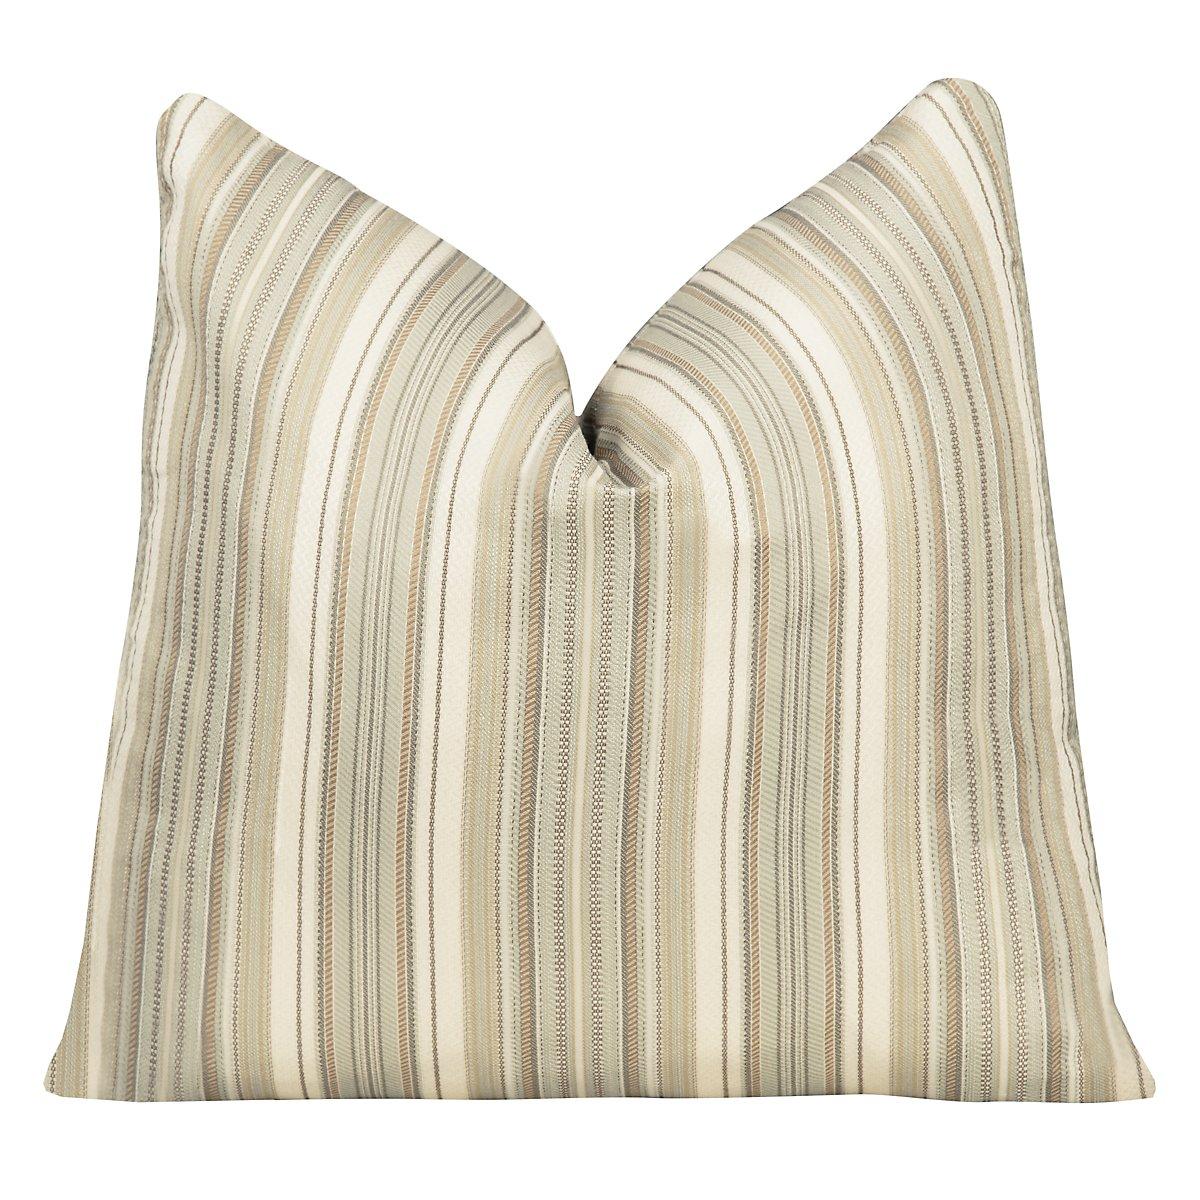 Erin Stripe Green Square Accent Pillow